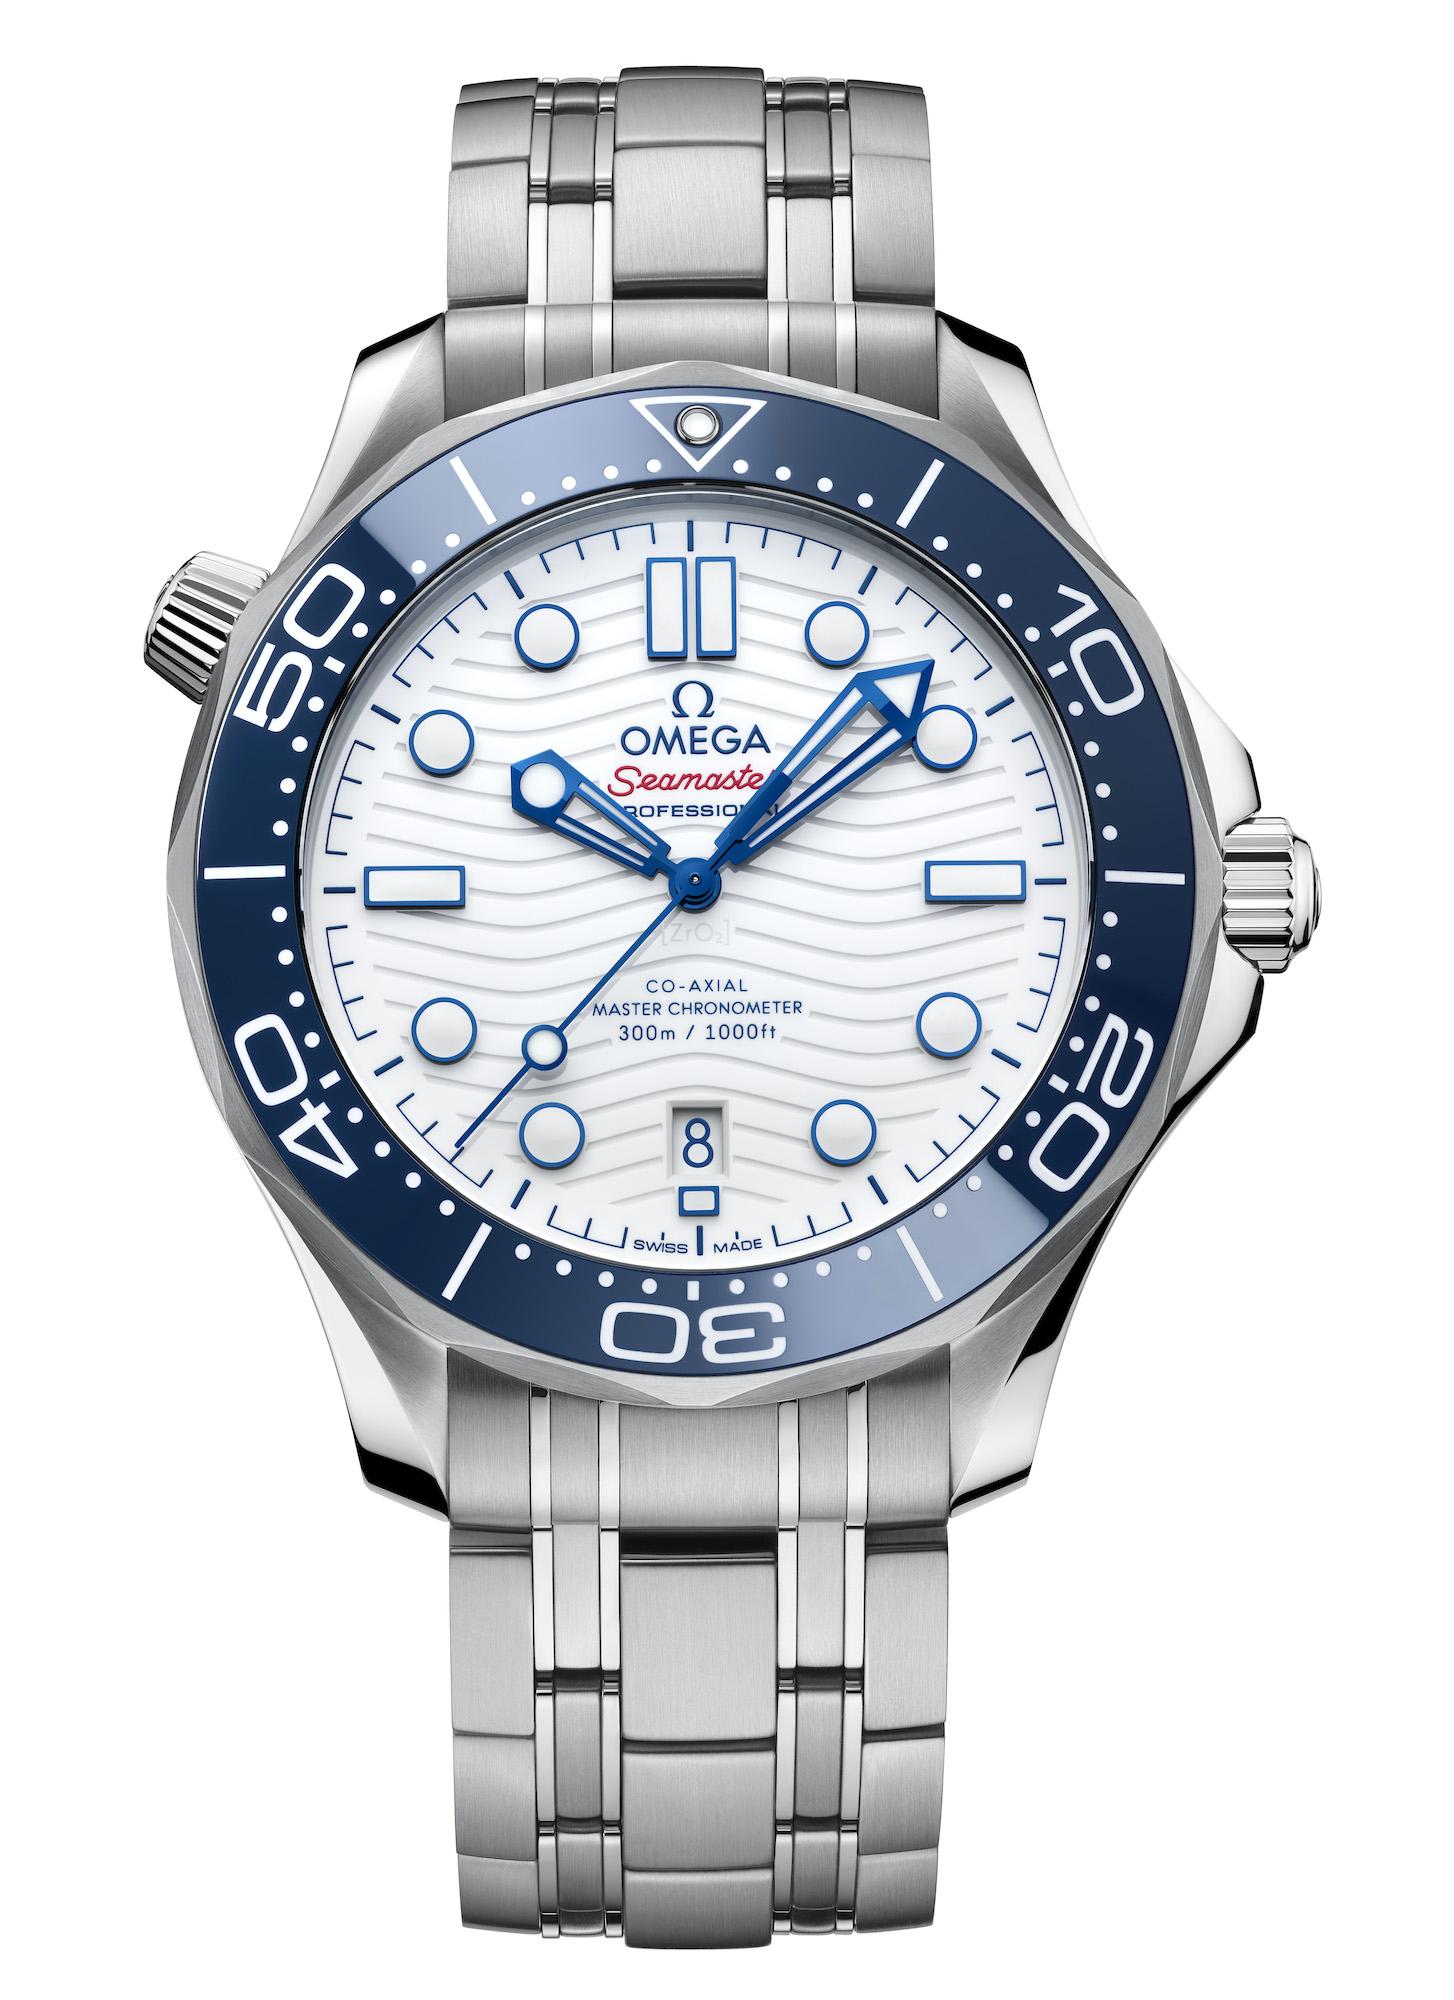 Omega Seamaster Diver 300M Tokyo 2020 522.30.42.20.04.001 Frontal